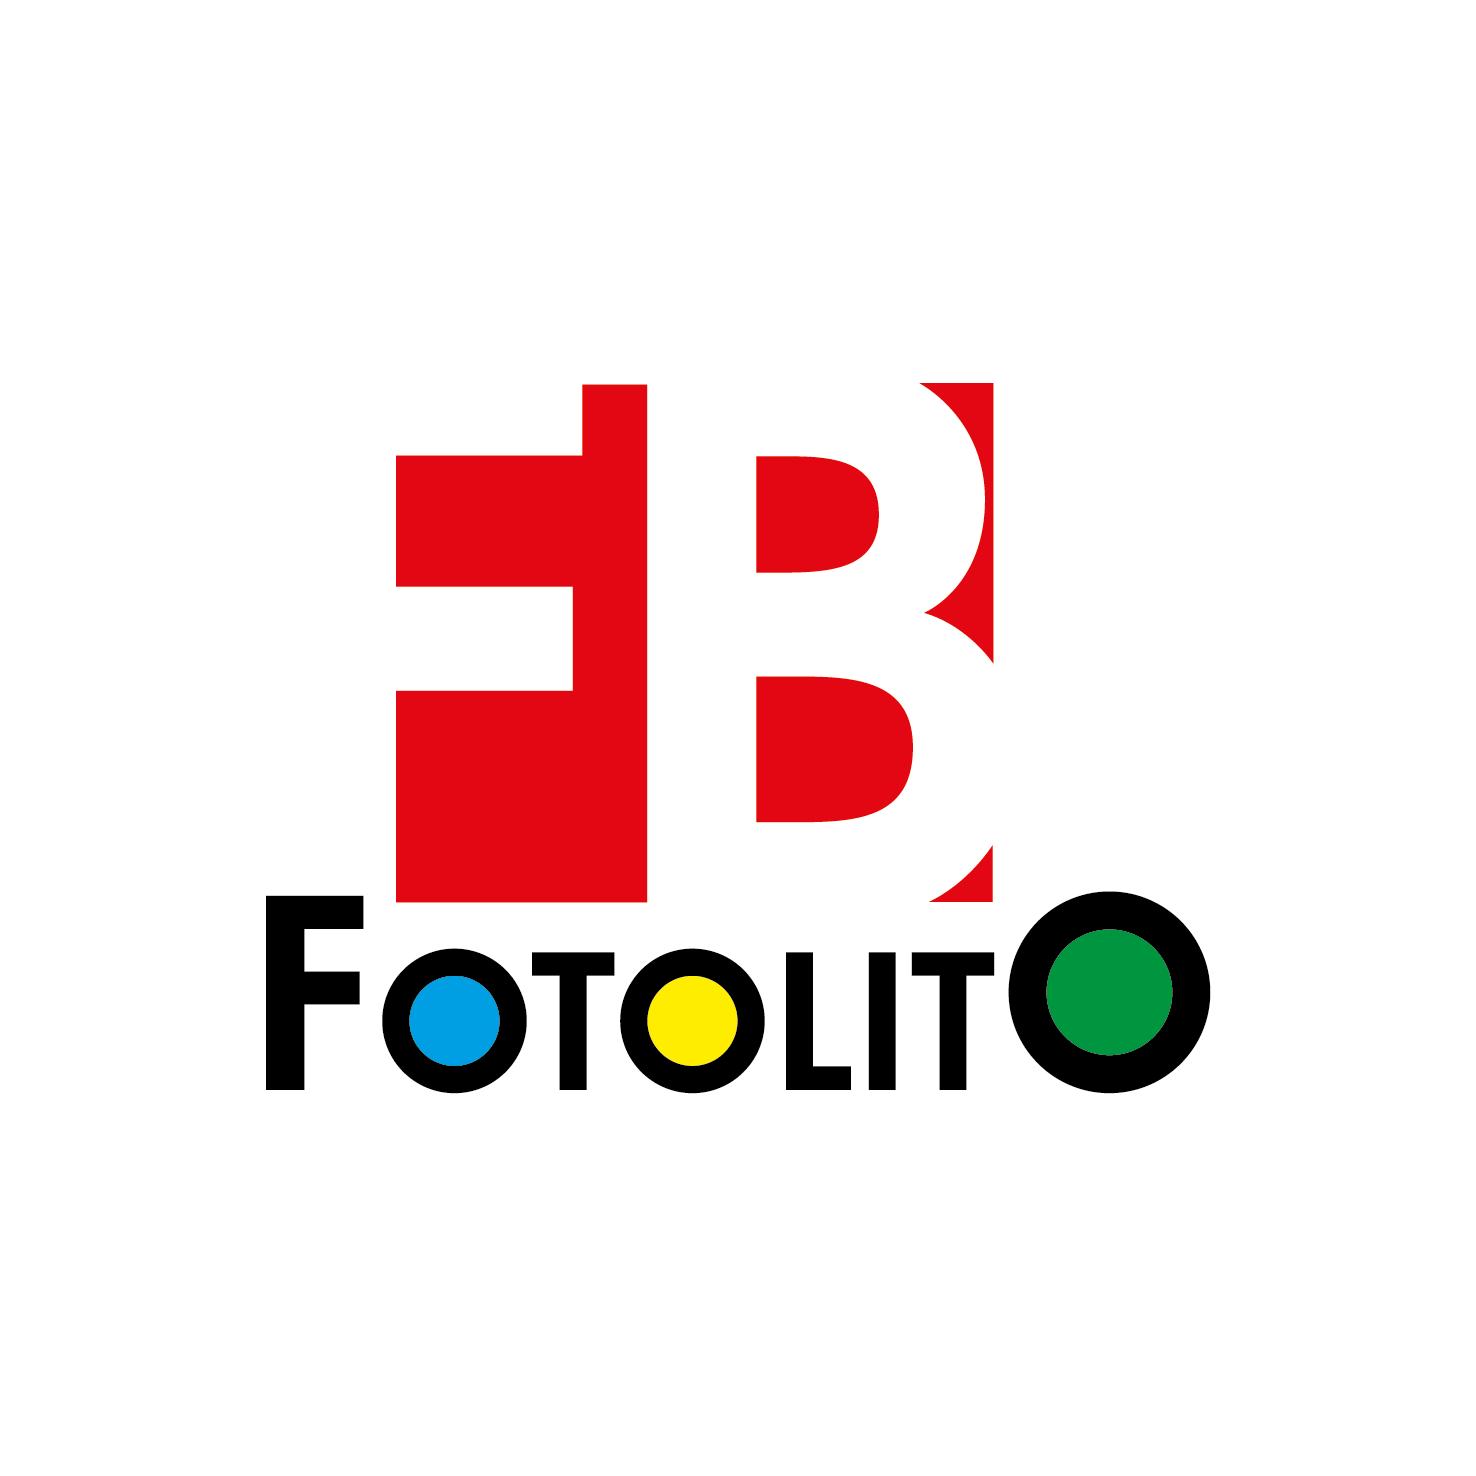 Fotolito FB